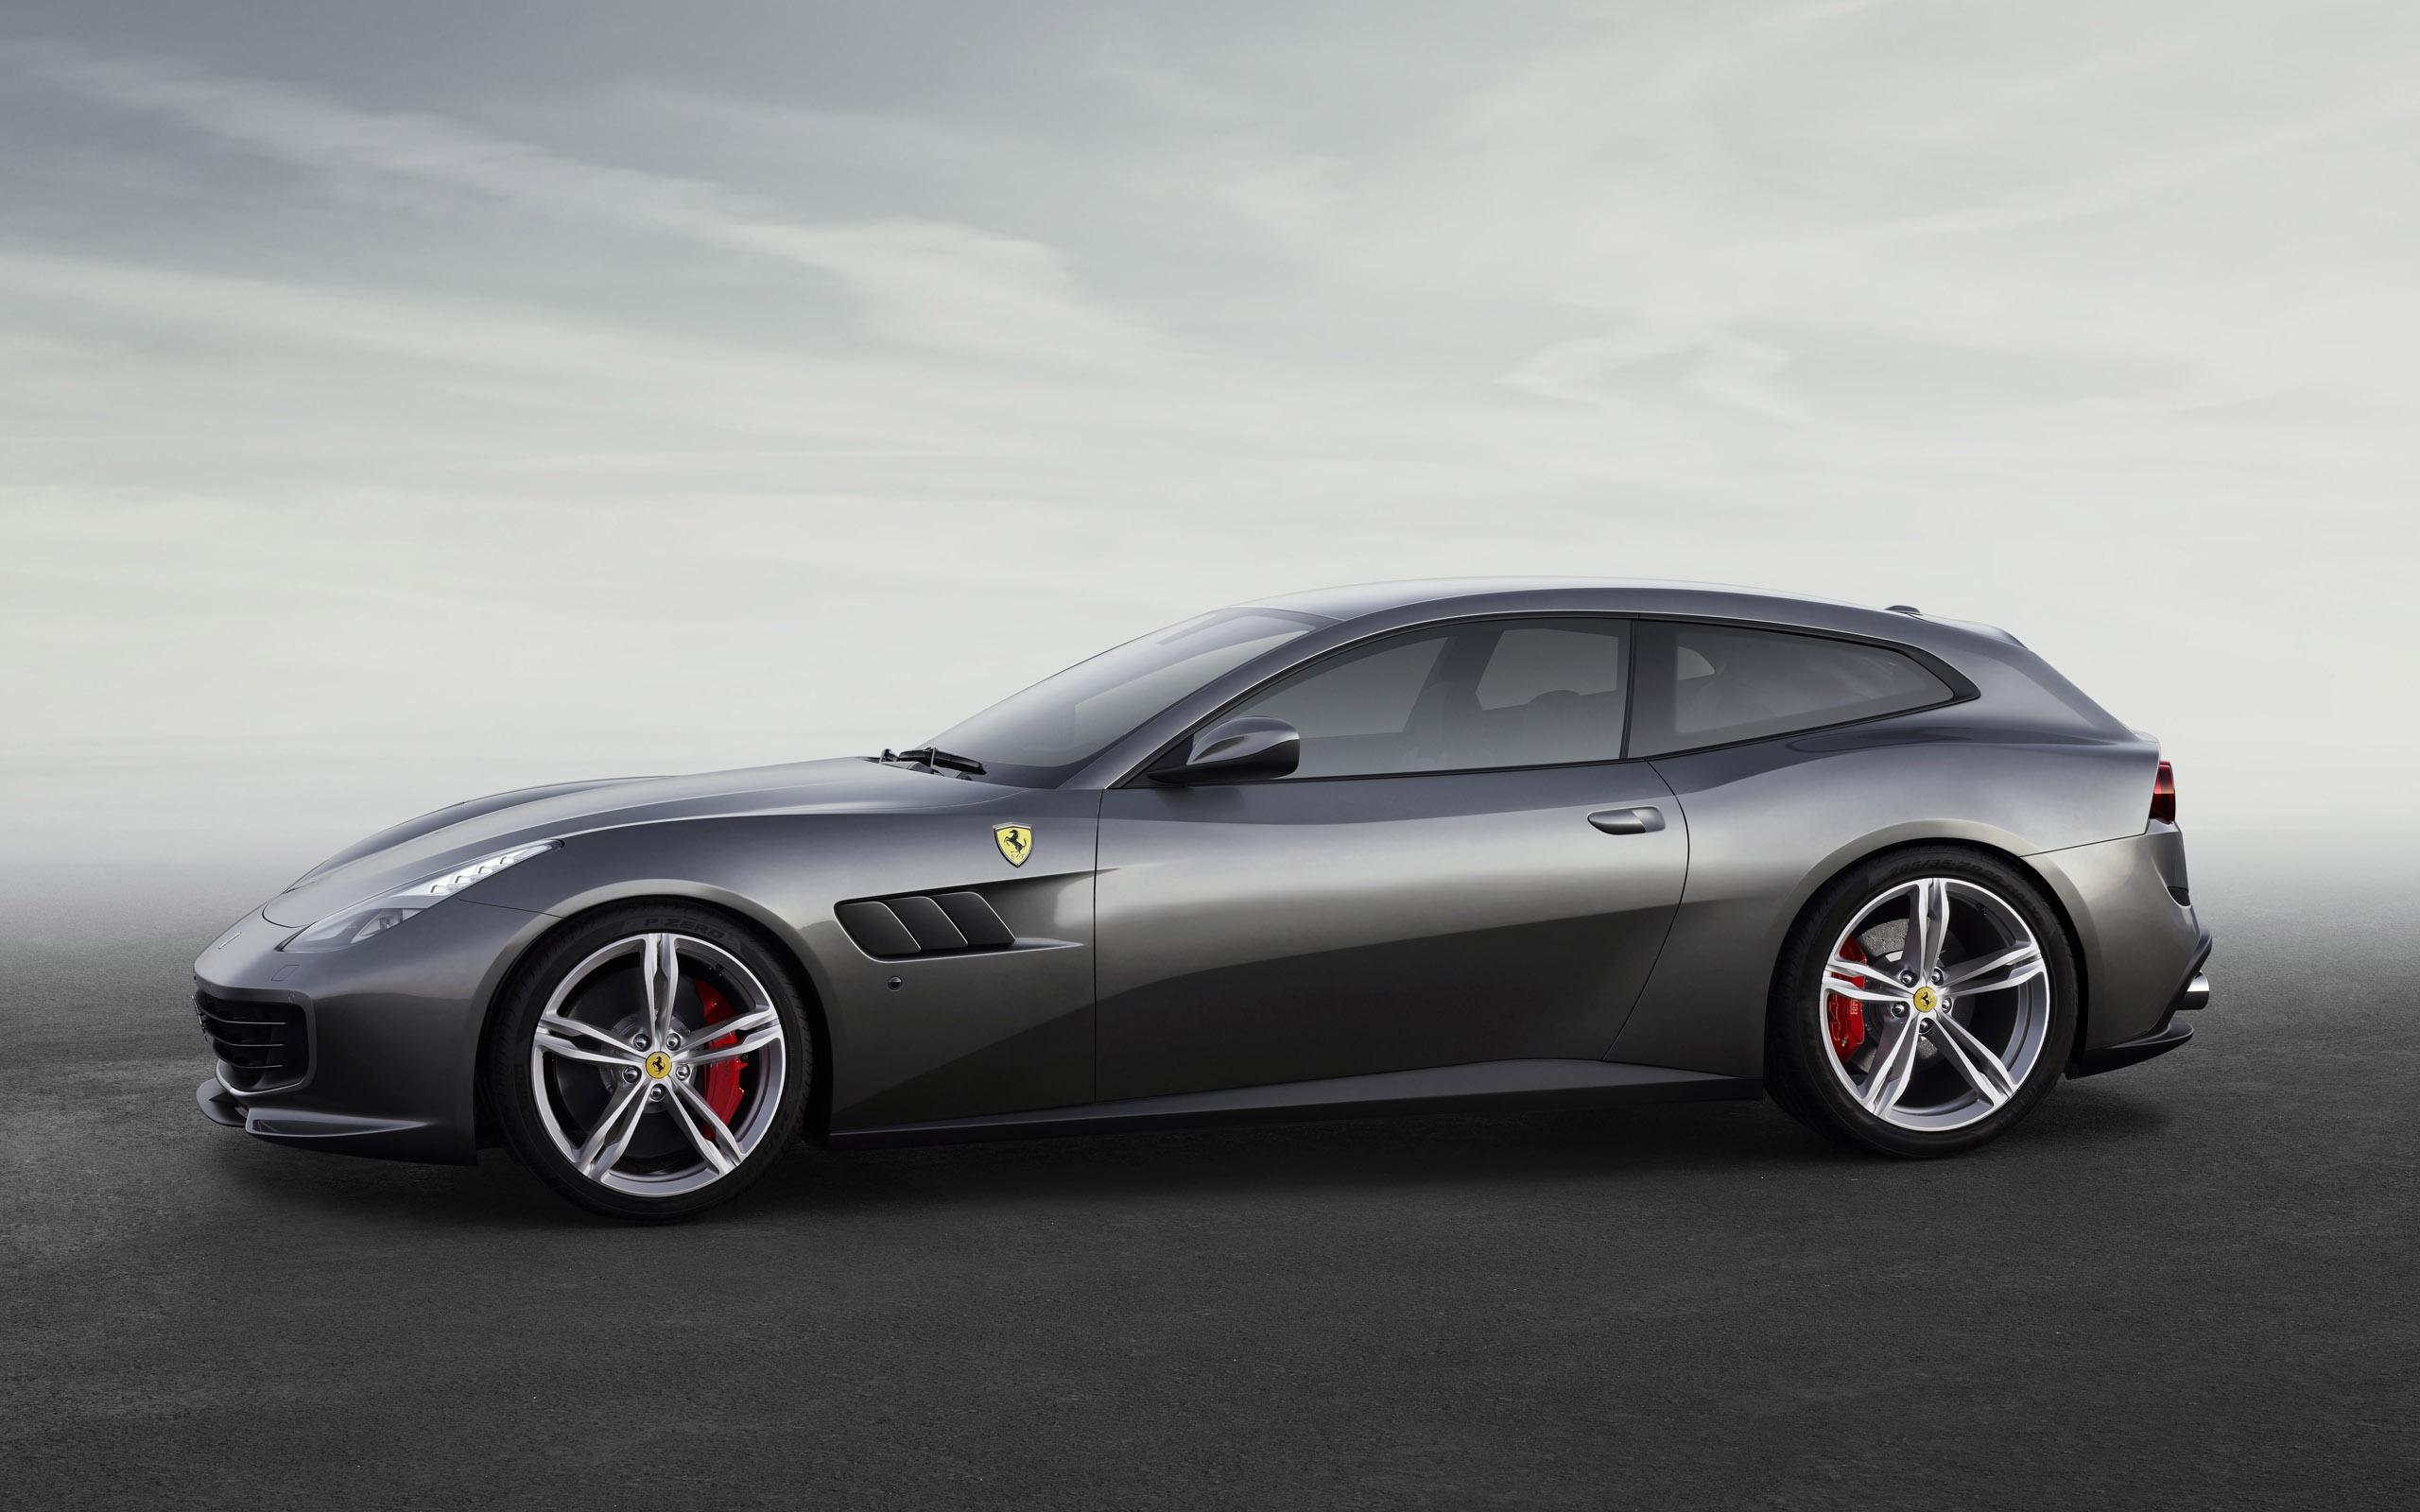 Ferrari Ff Gtc4lusso 2016 Desktop Wallpaper 2560x1600